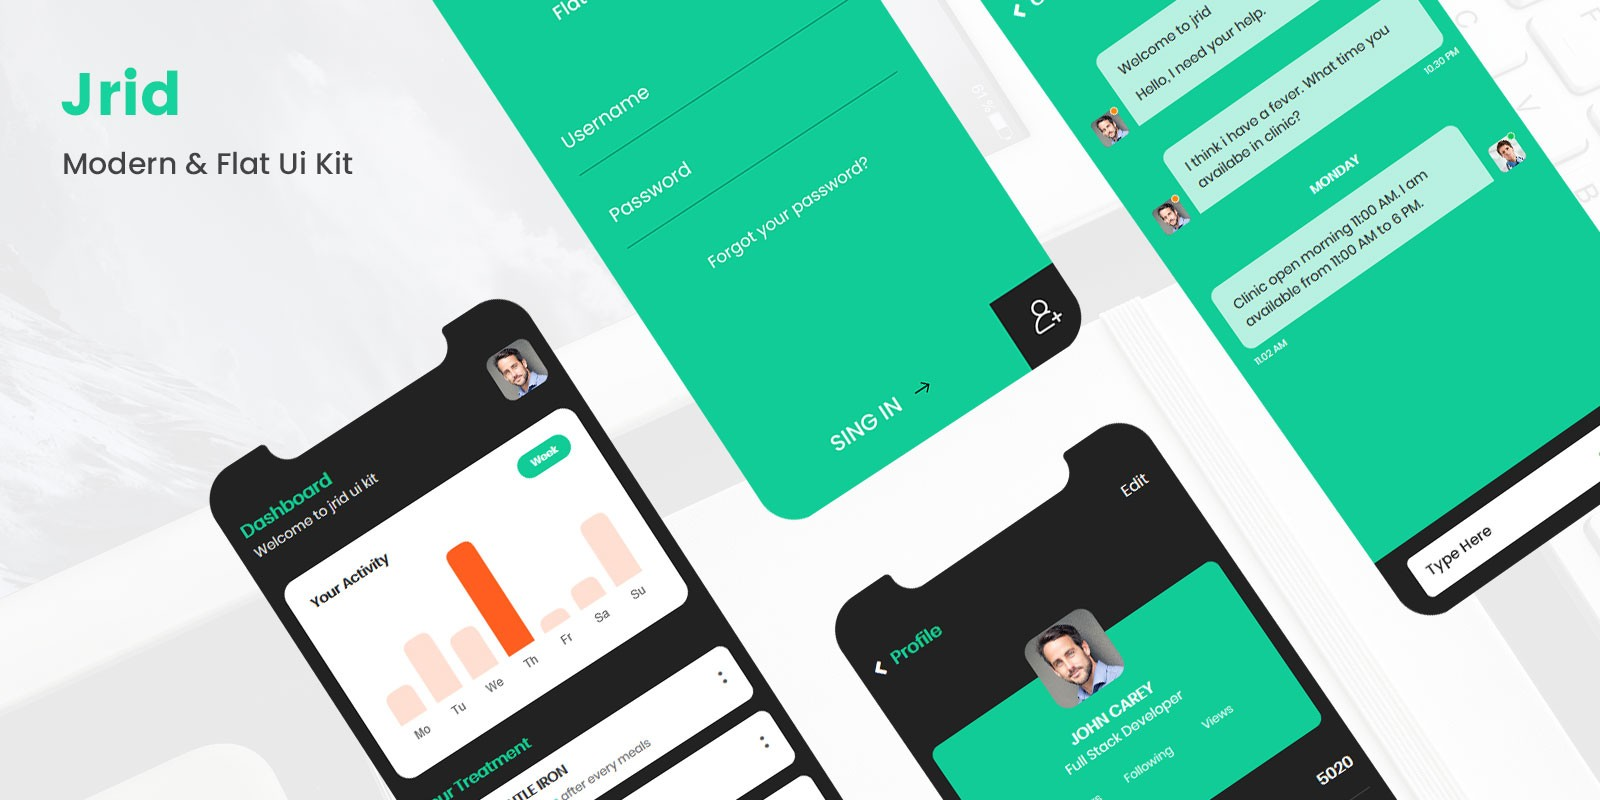 Jrid - Modern Flat UI kit Ionic